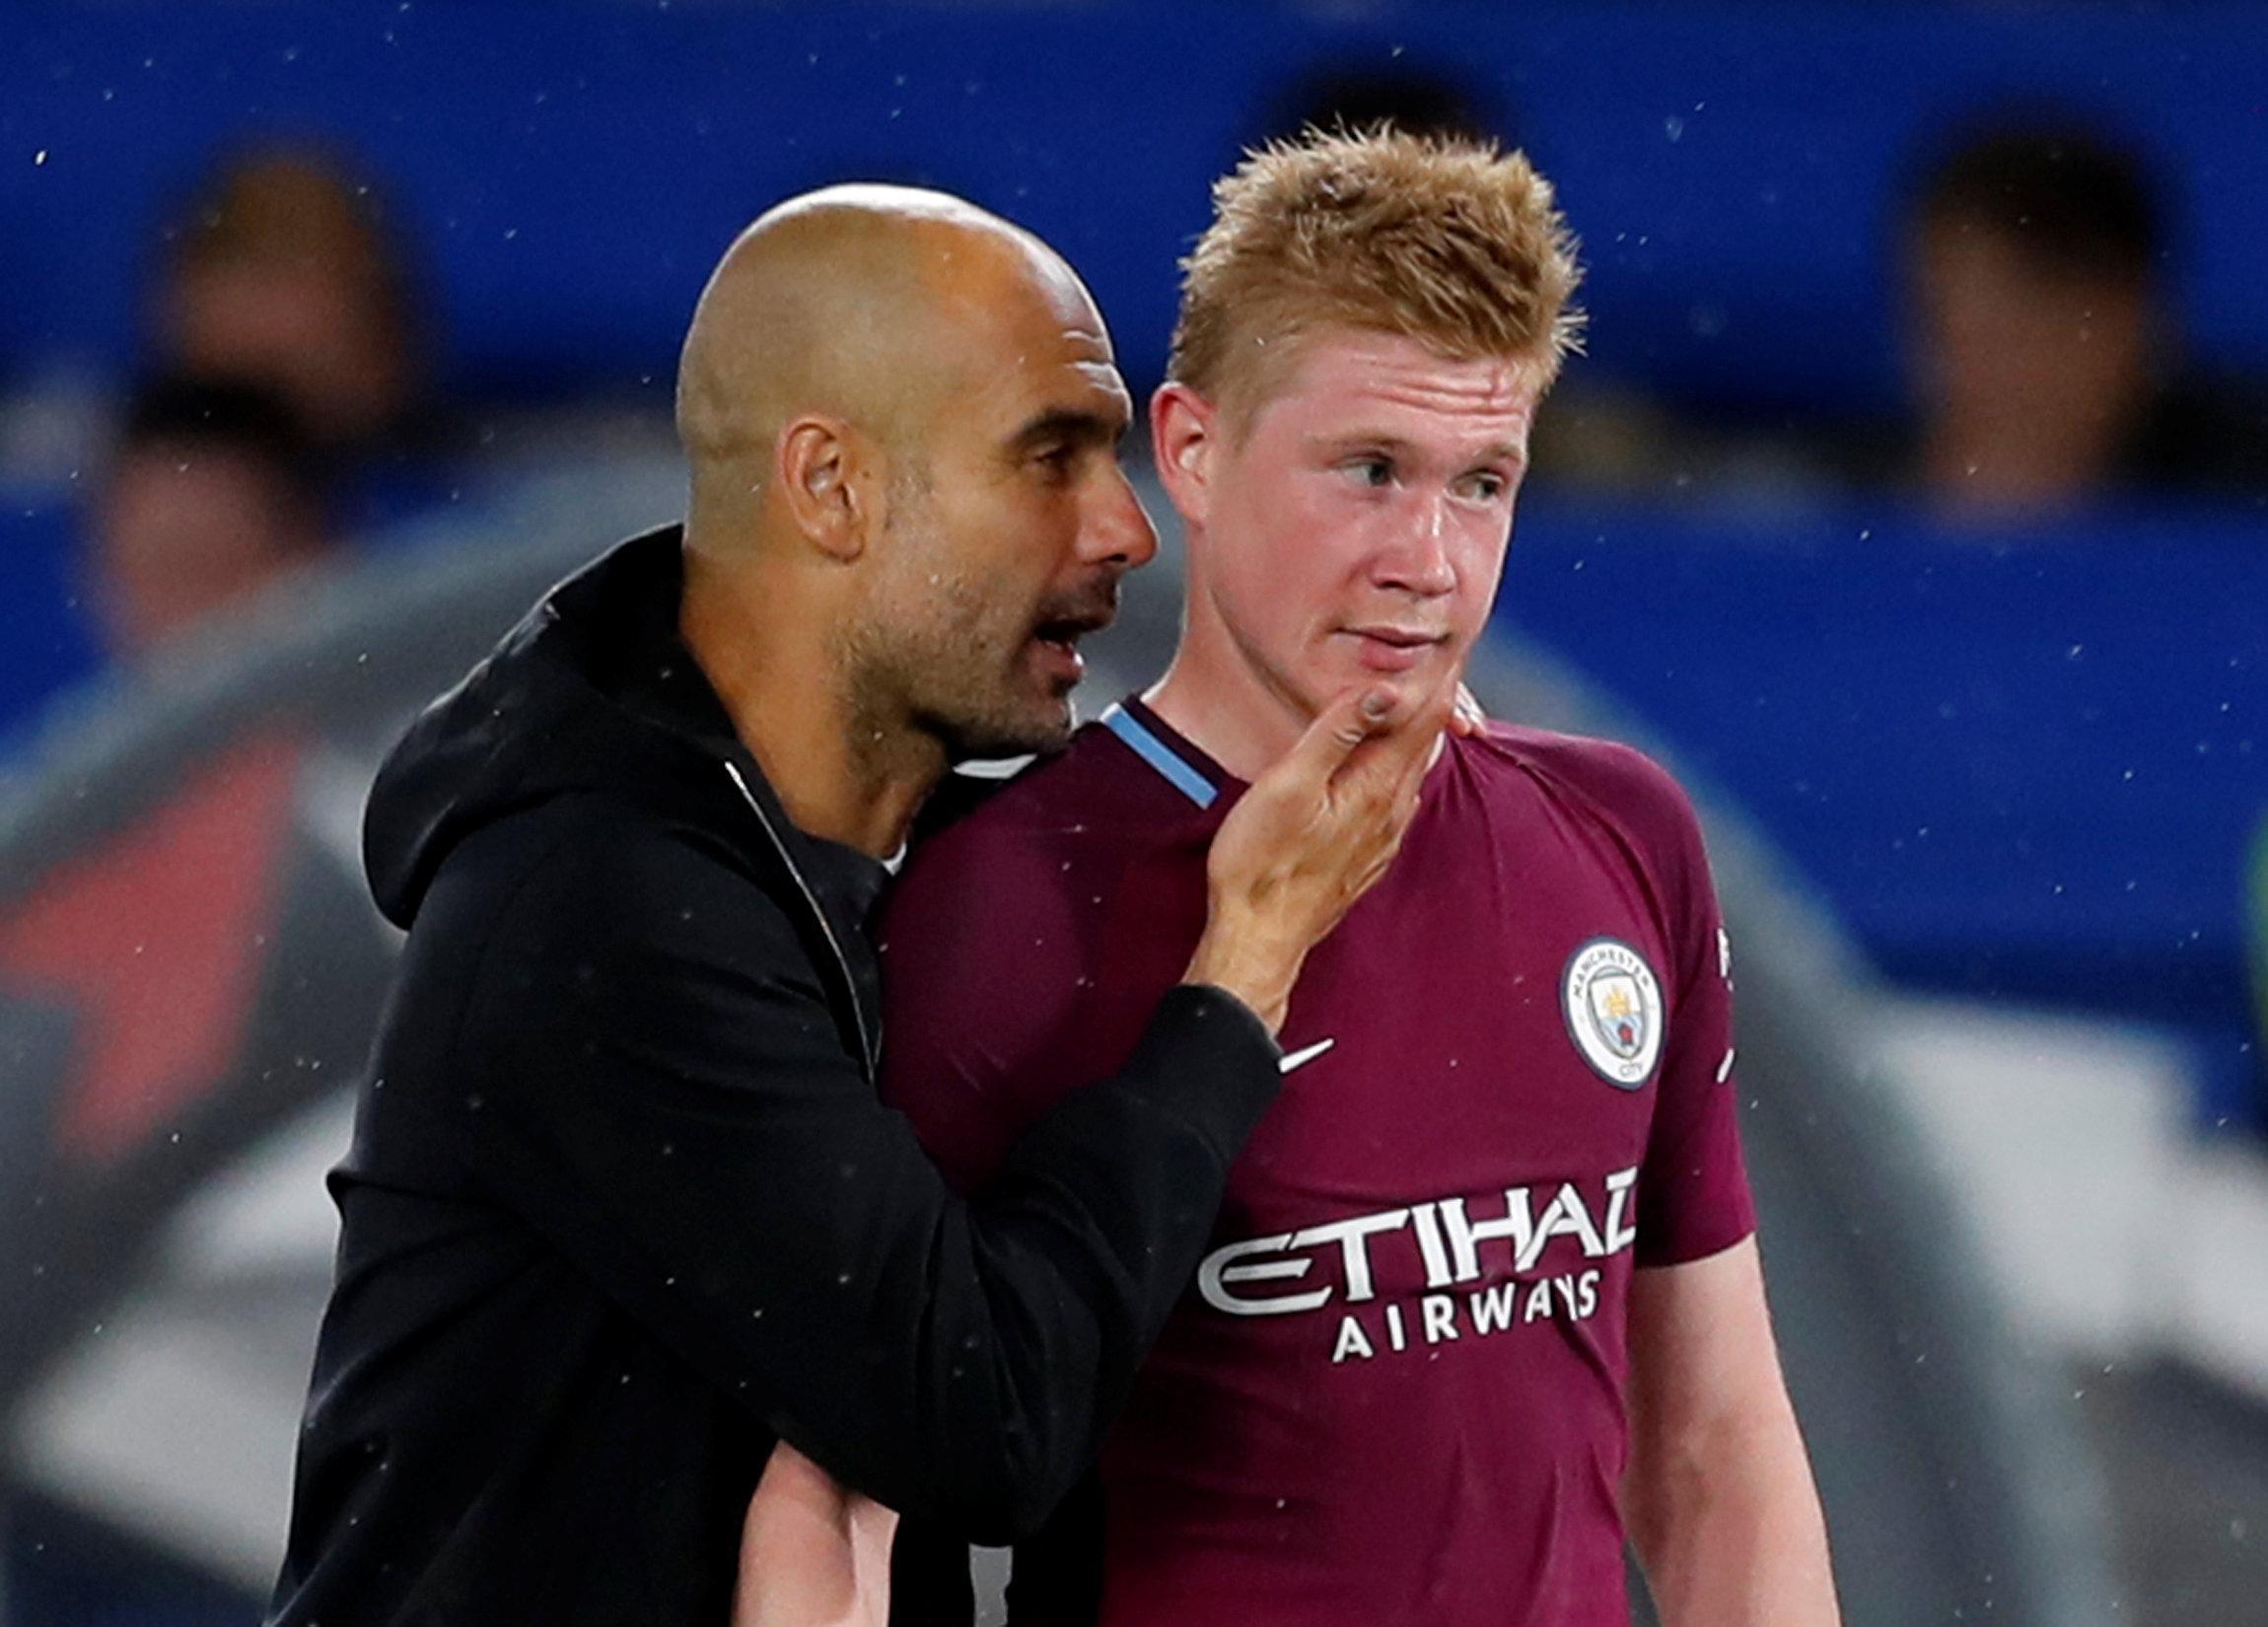 """You're so bad. Wish I kept that Roberts bloke!"""